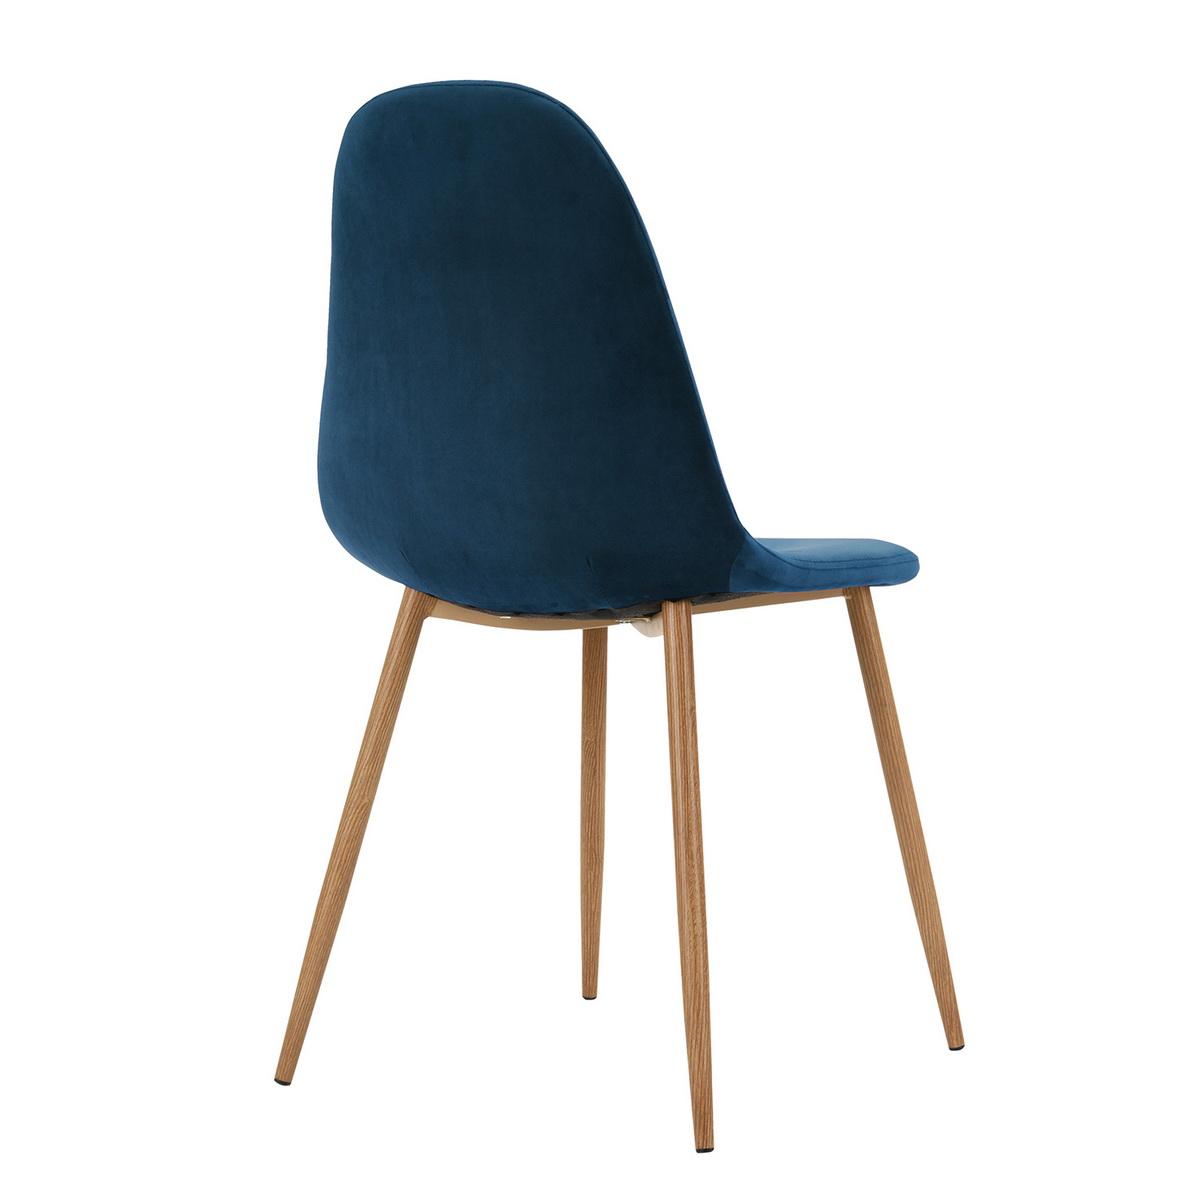 lot de 4 chaises scandinave tendance velours anthracite pied m tal chrom ebay